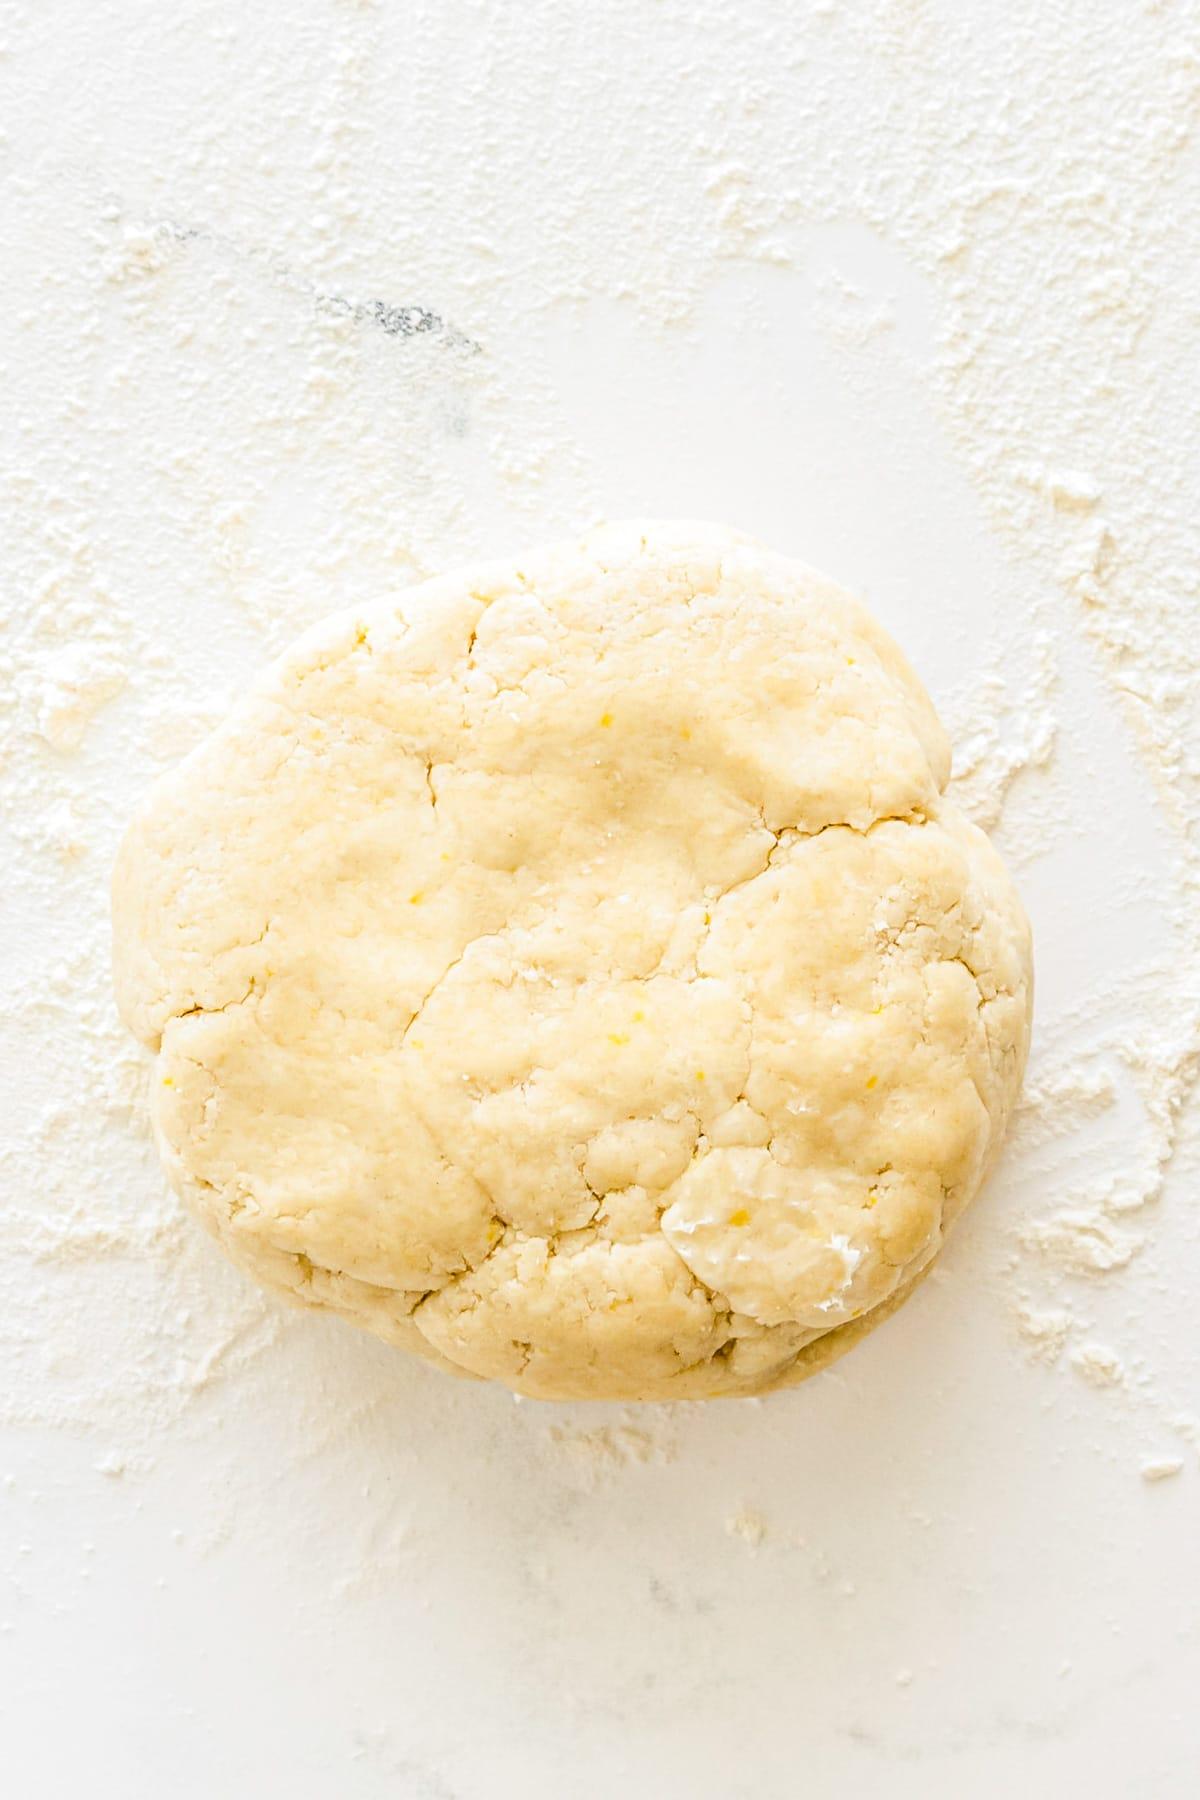 pie crust dough ball on a floured counter surface